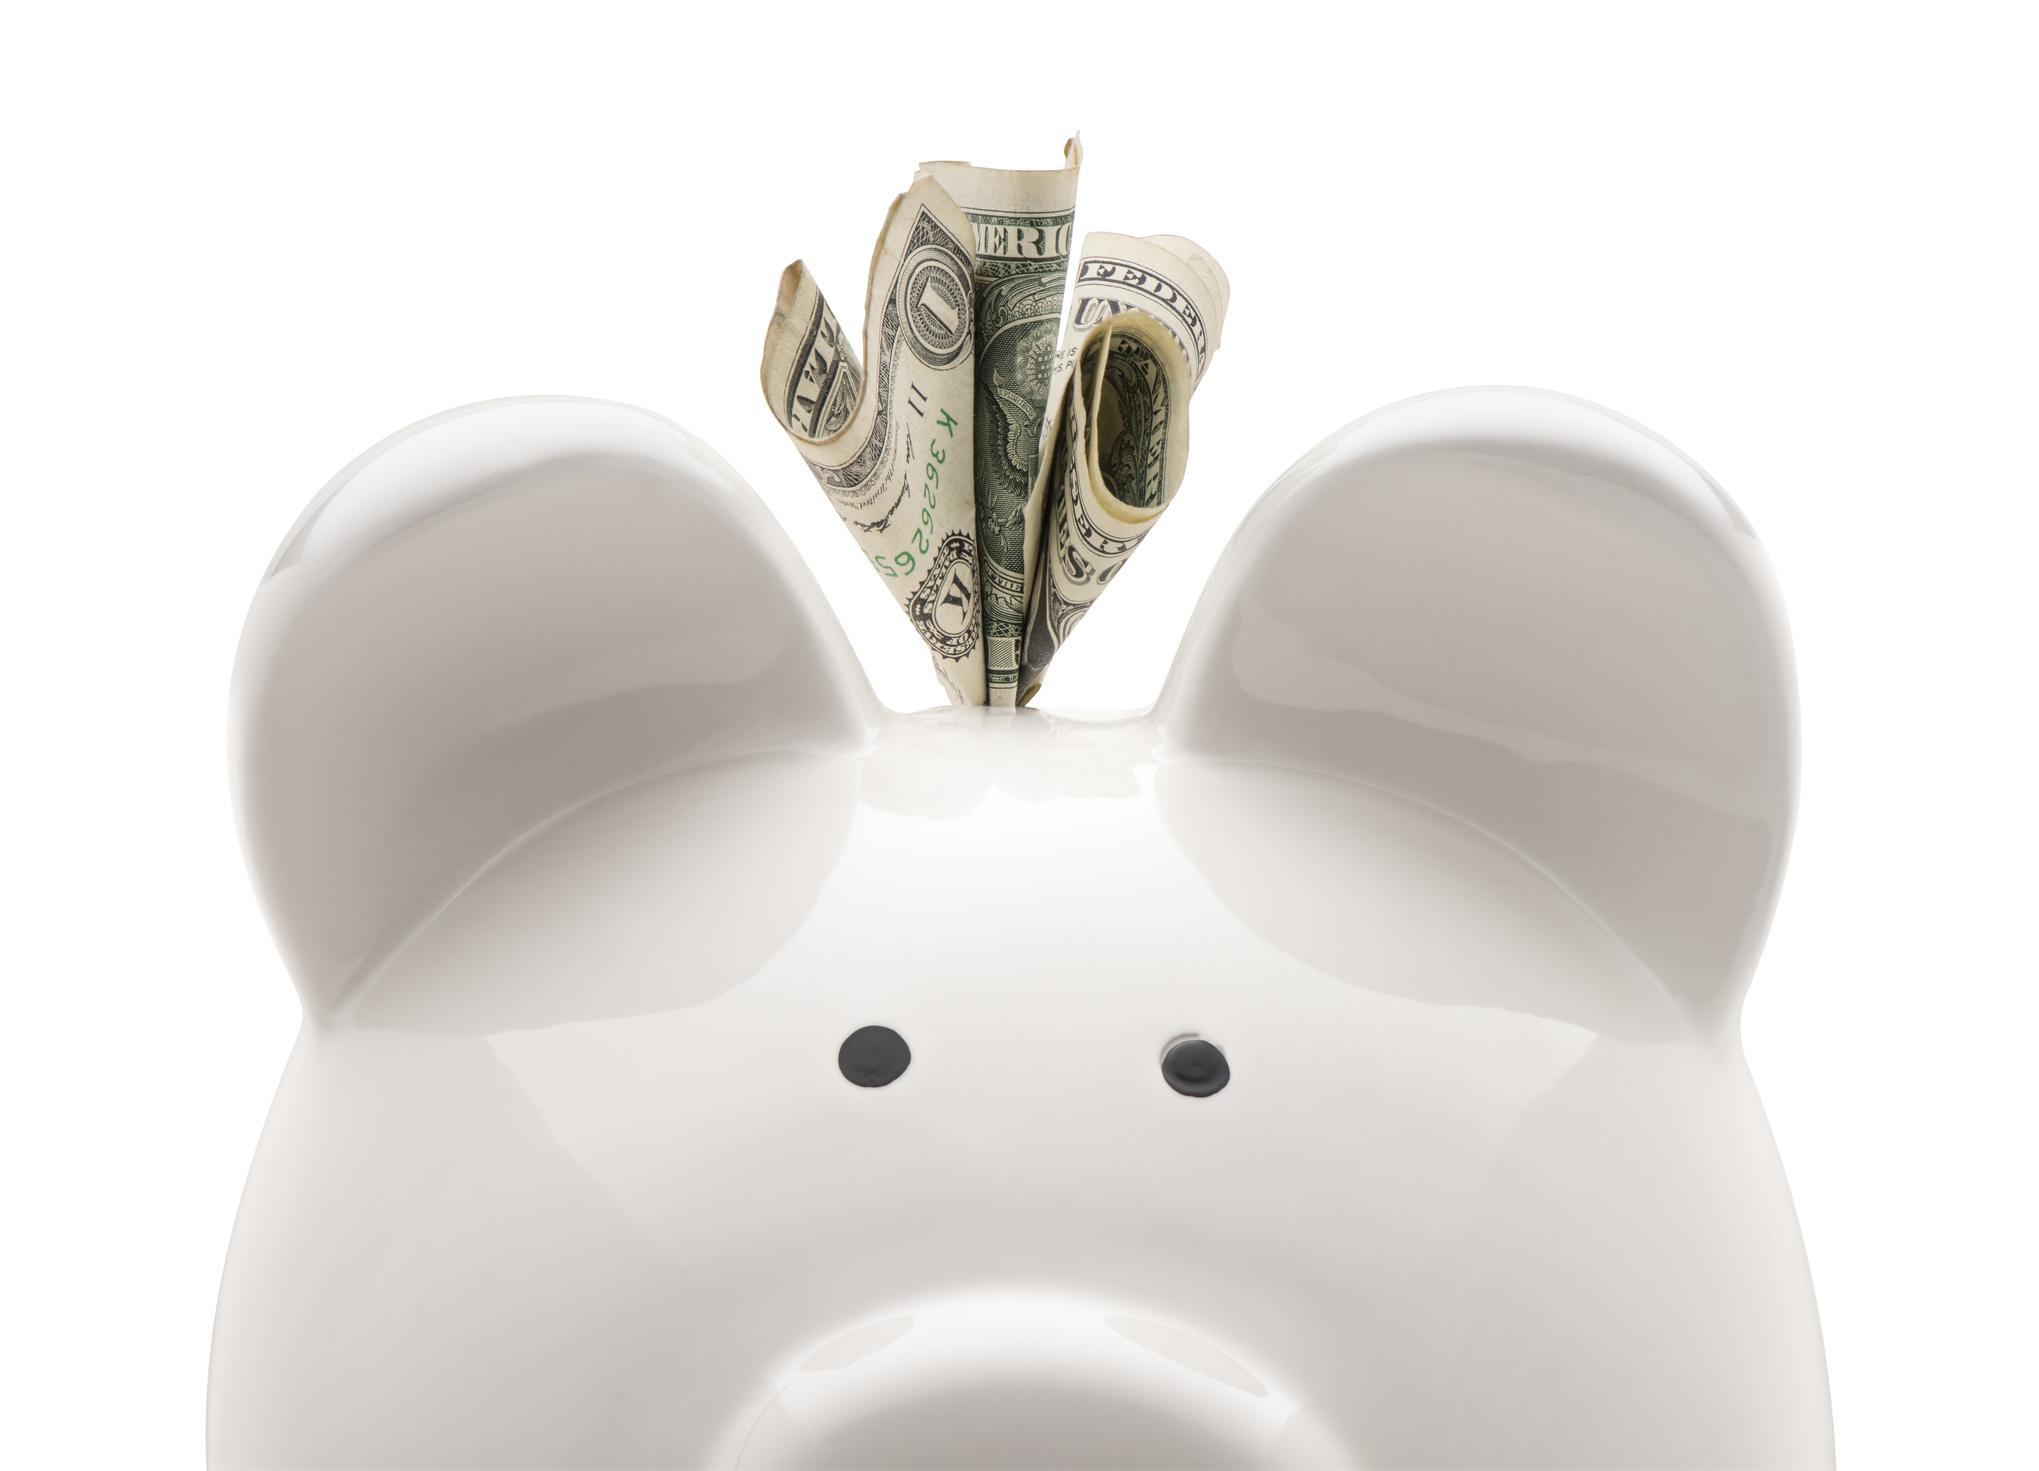 Piggy bank with dollar bills sticking out